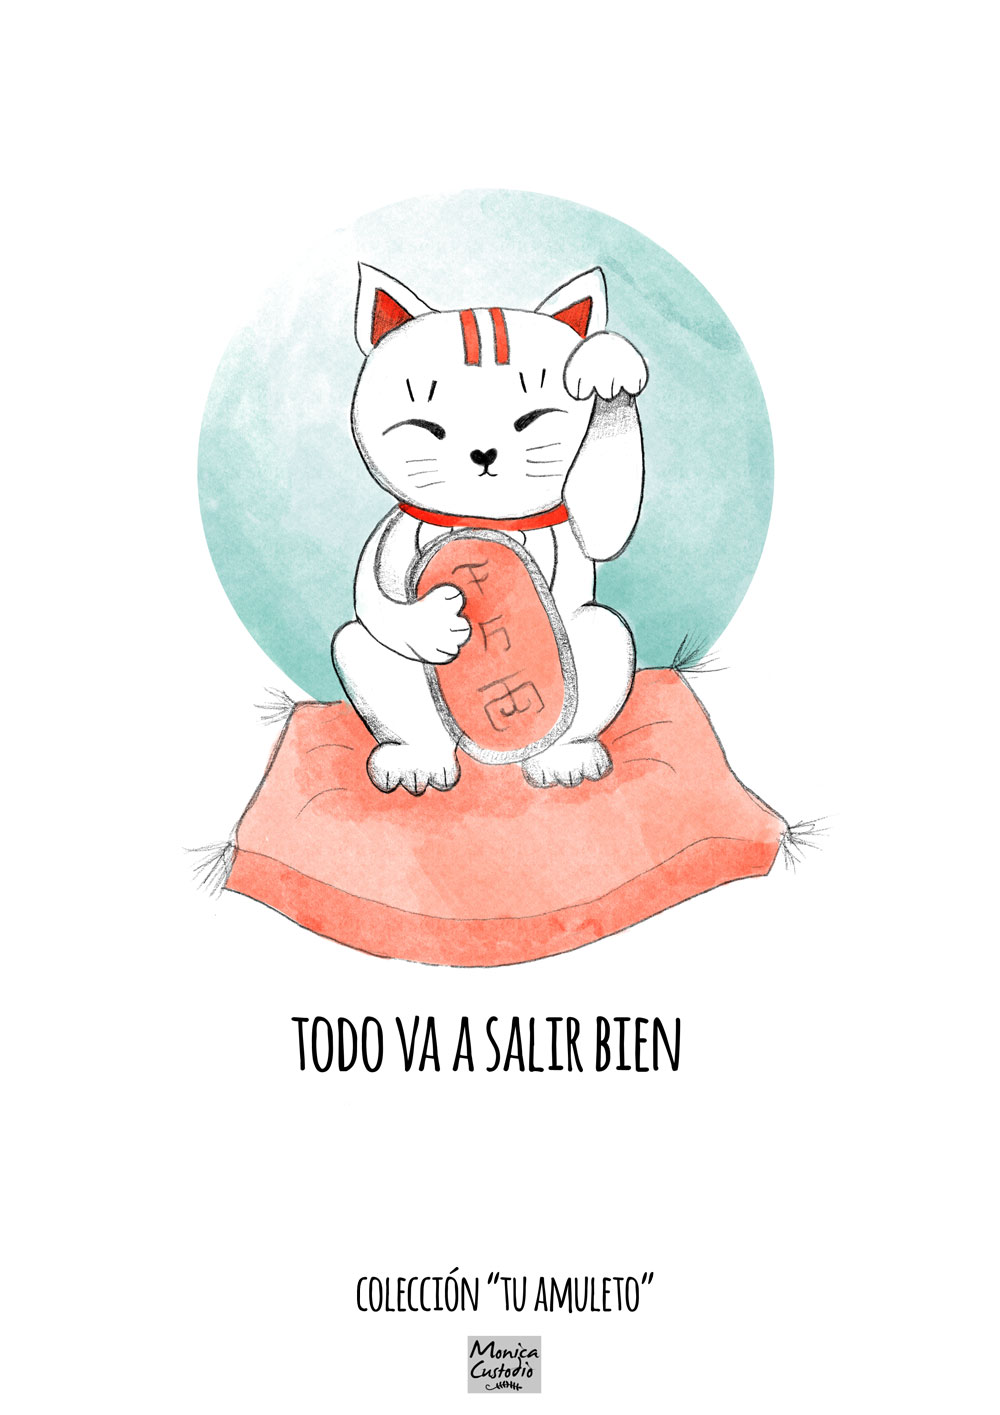 Amuleto gato de la Suerte Mónica Custodio